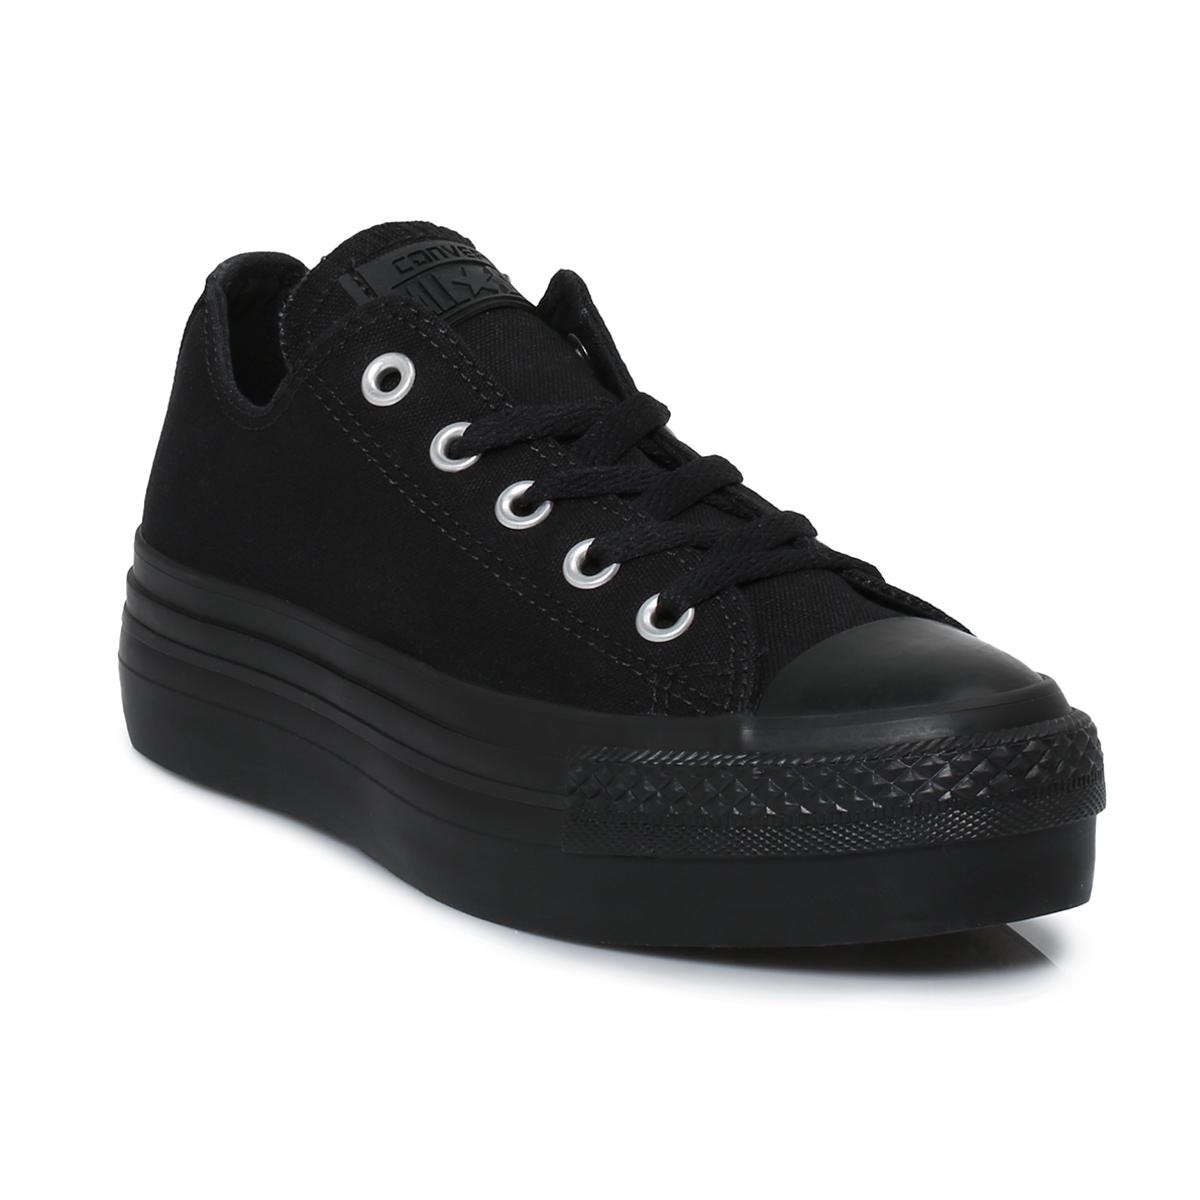 all black converse platform